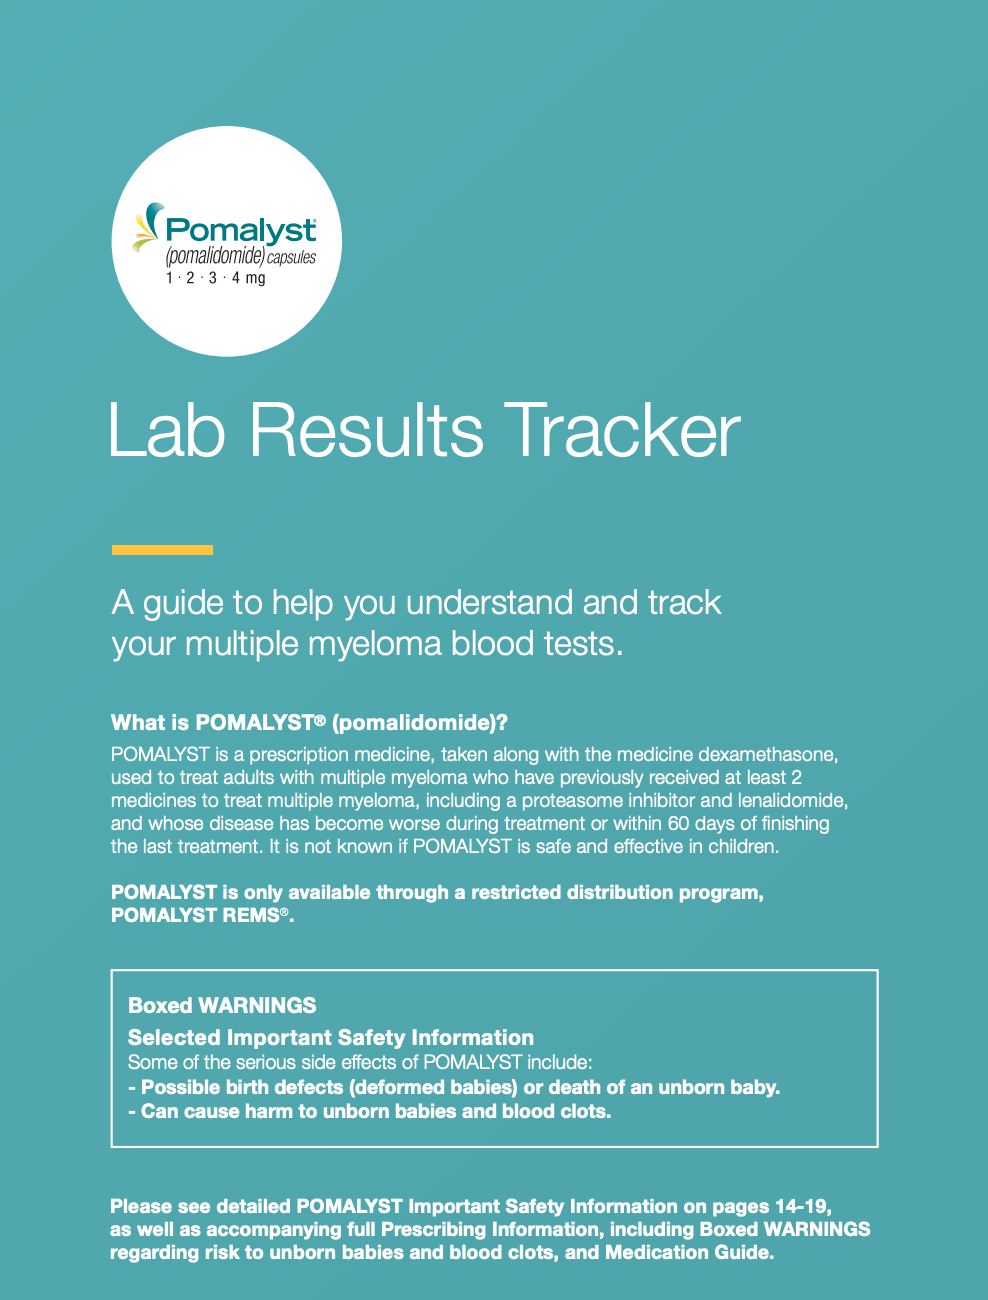 POMALYST® (pomalidomide) Lab Results Tracker